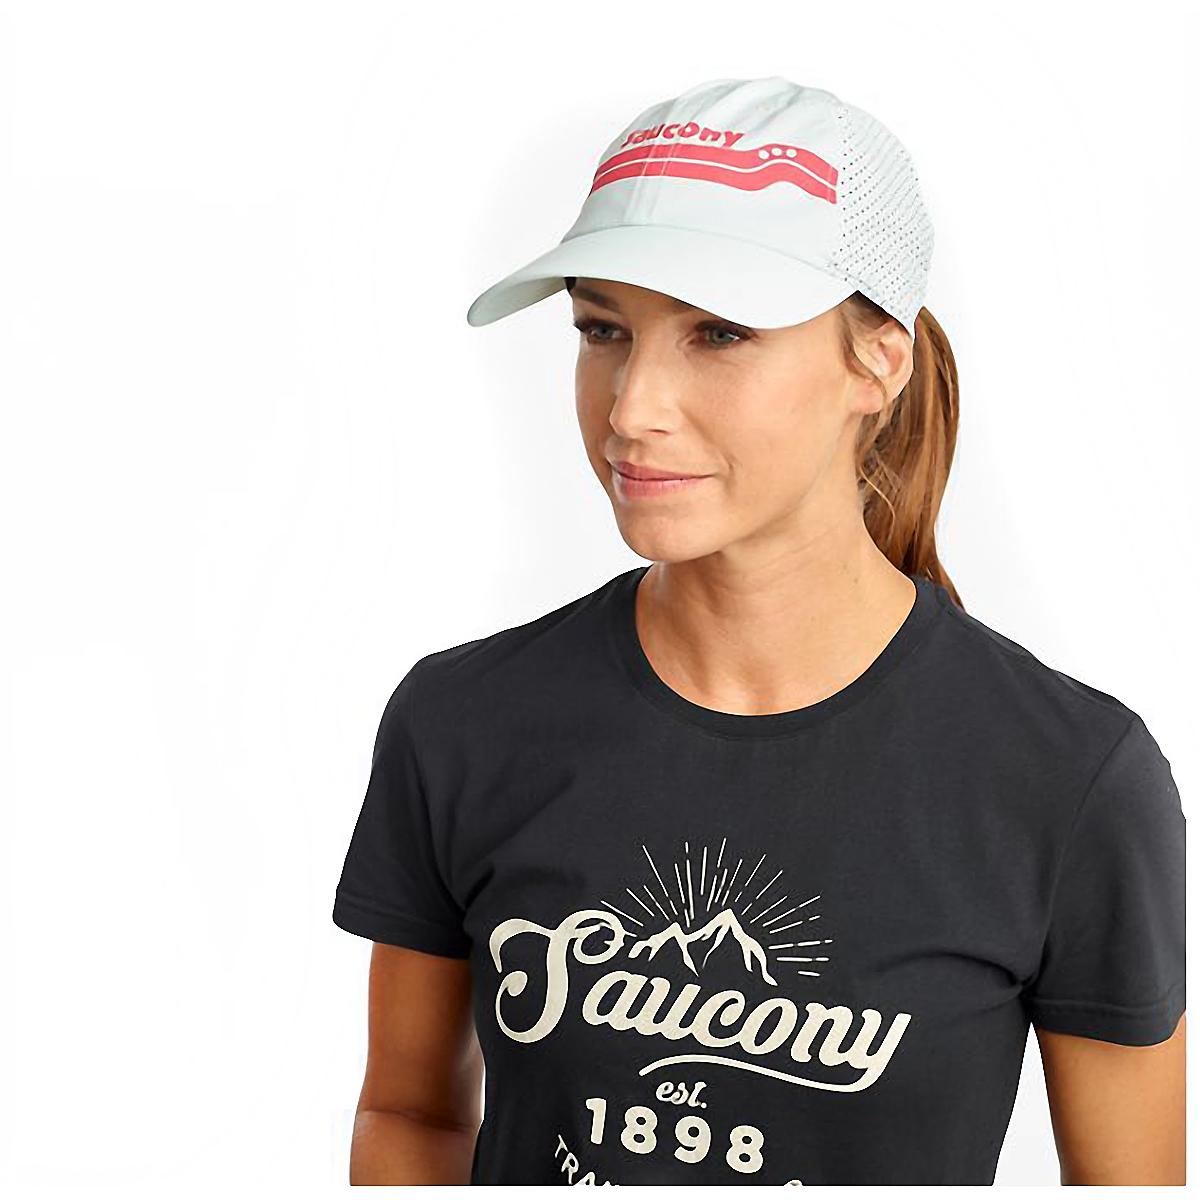 Saucony Doubleback Hat - Color: Opal Blue, Opal Blue, large, image 1